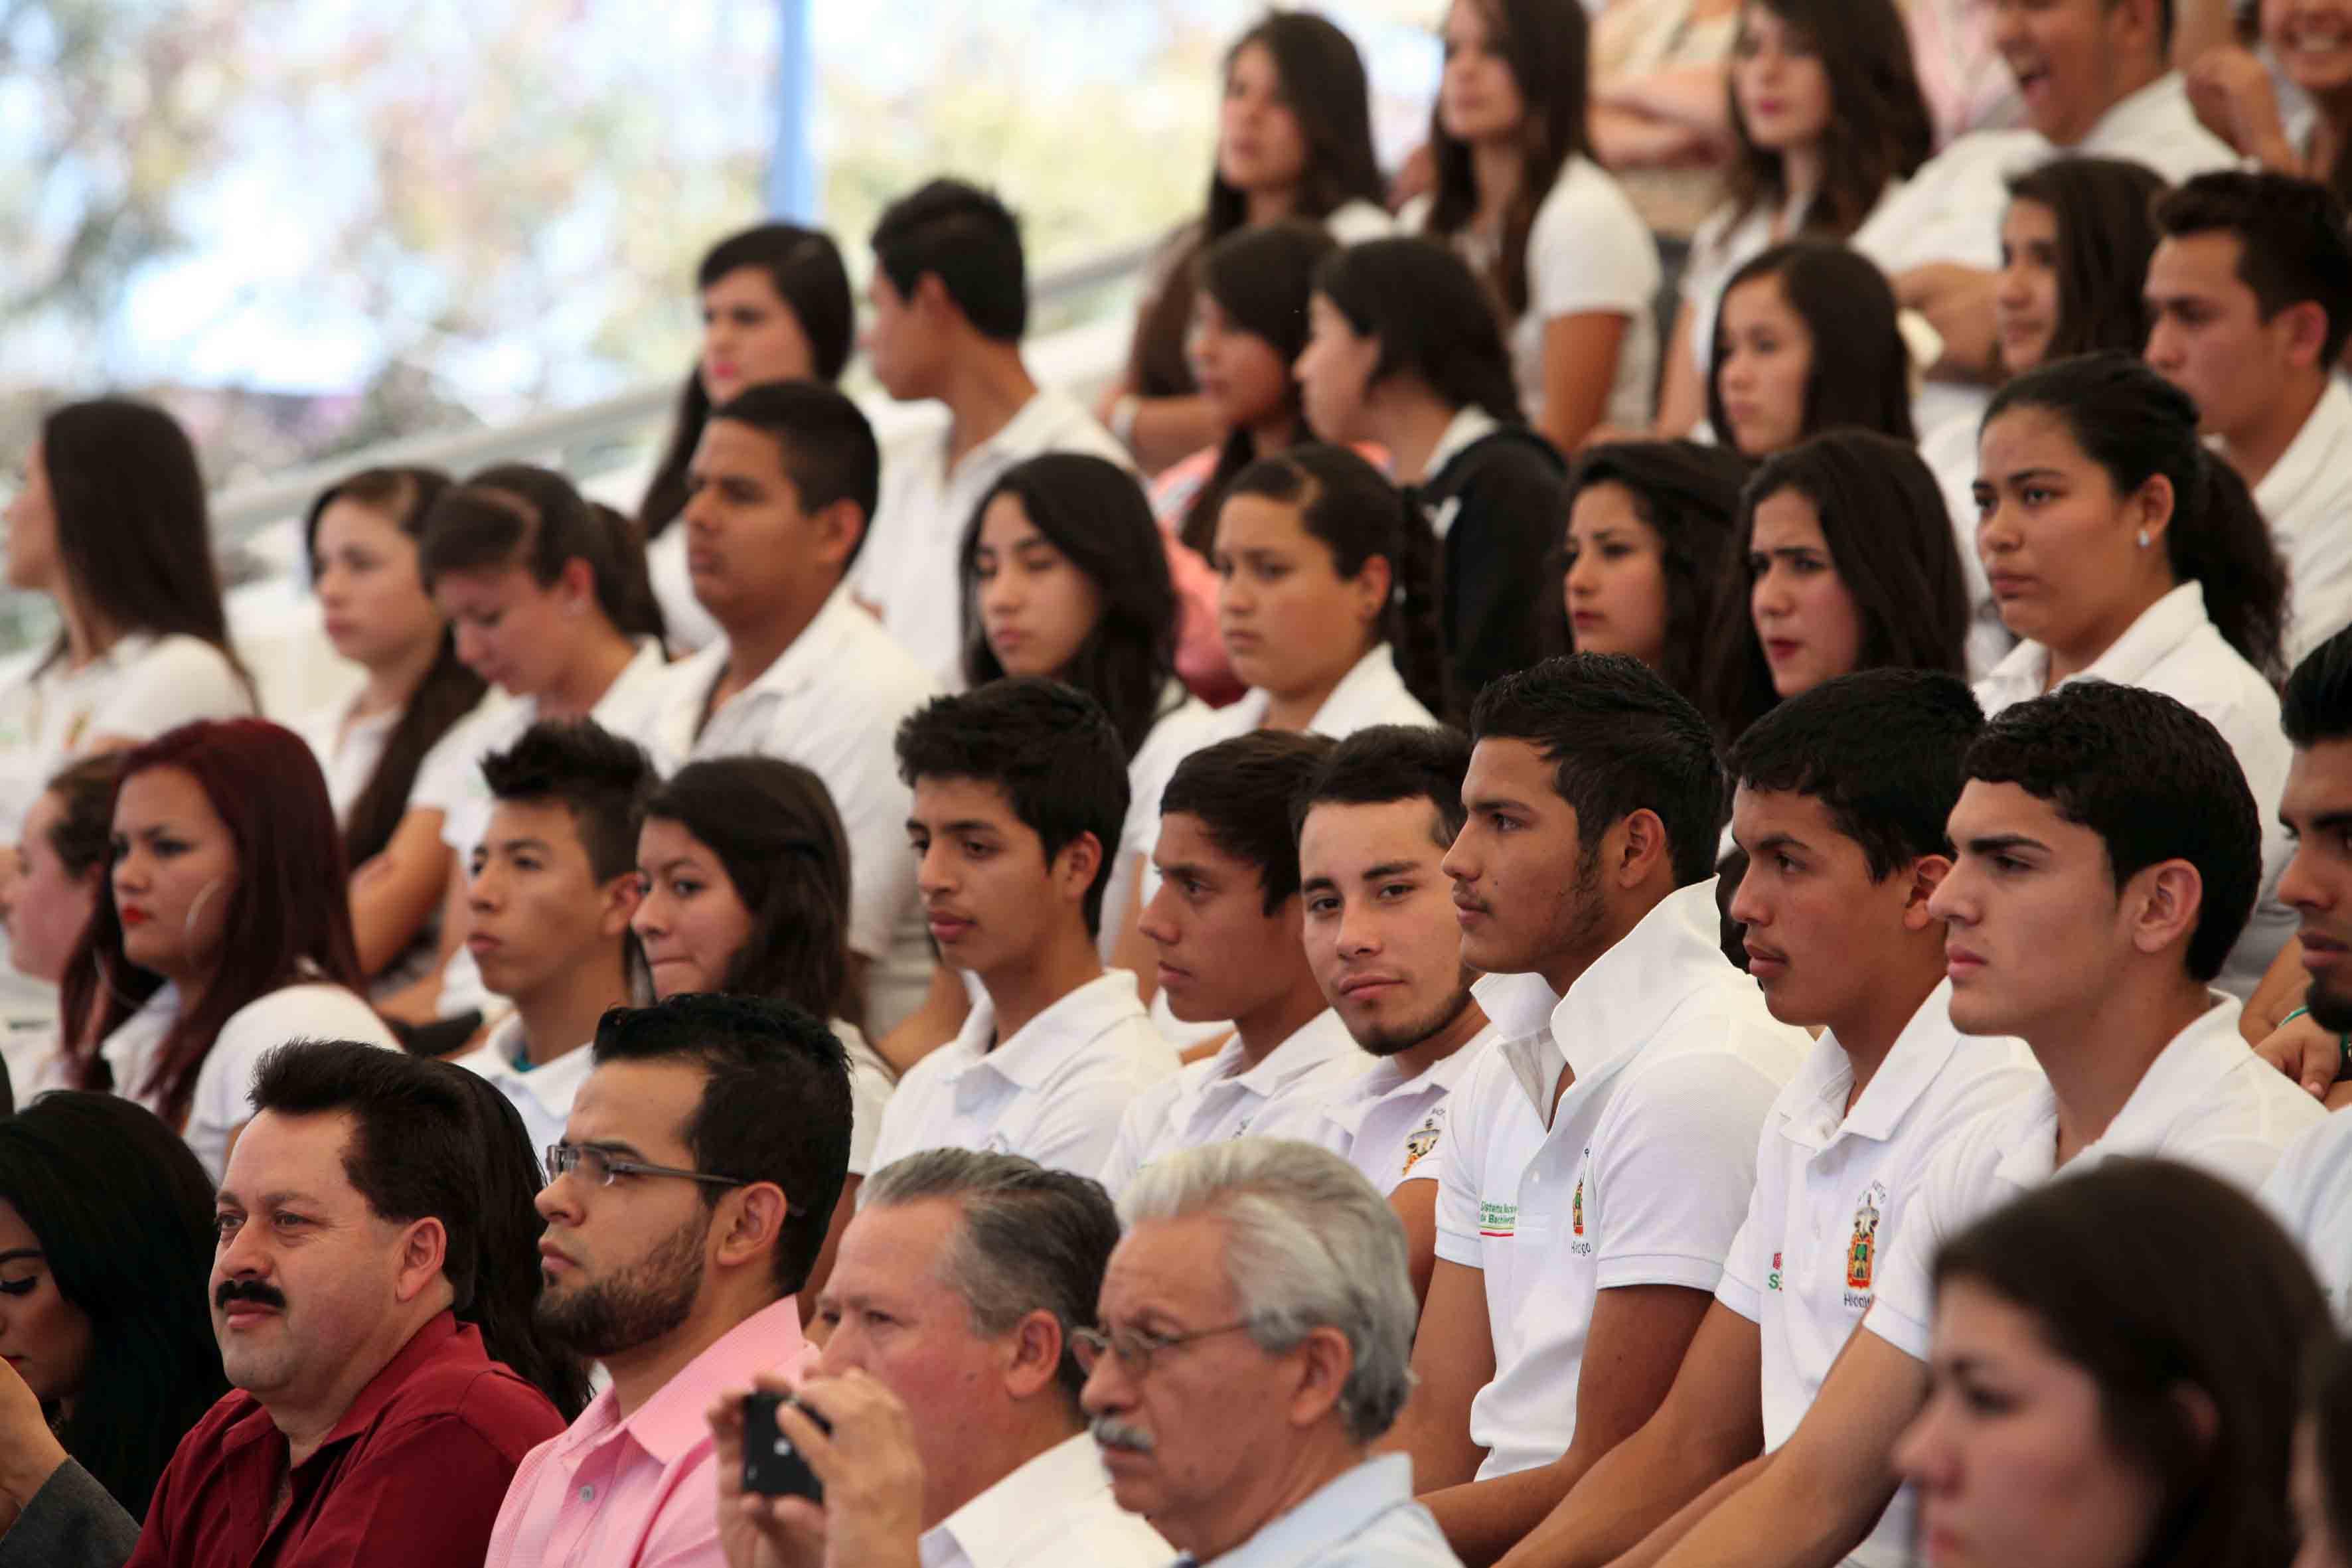 En la imagen alumnos de la Preparatoria San Martín Hidalgo UdeG